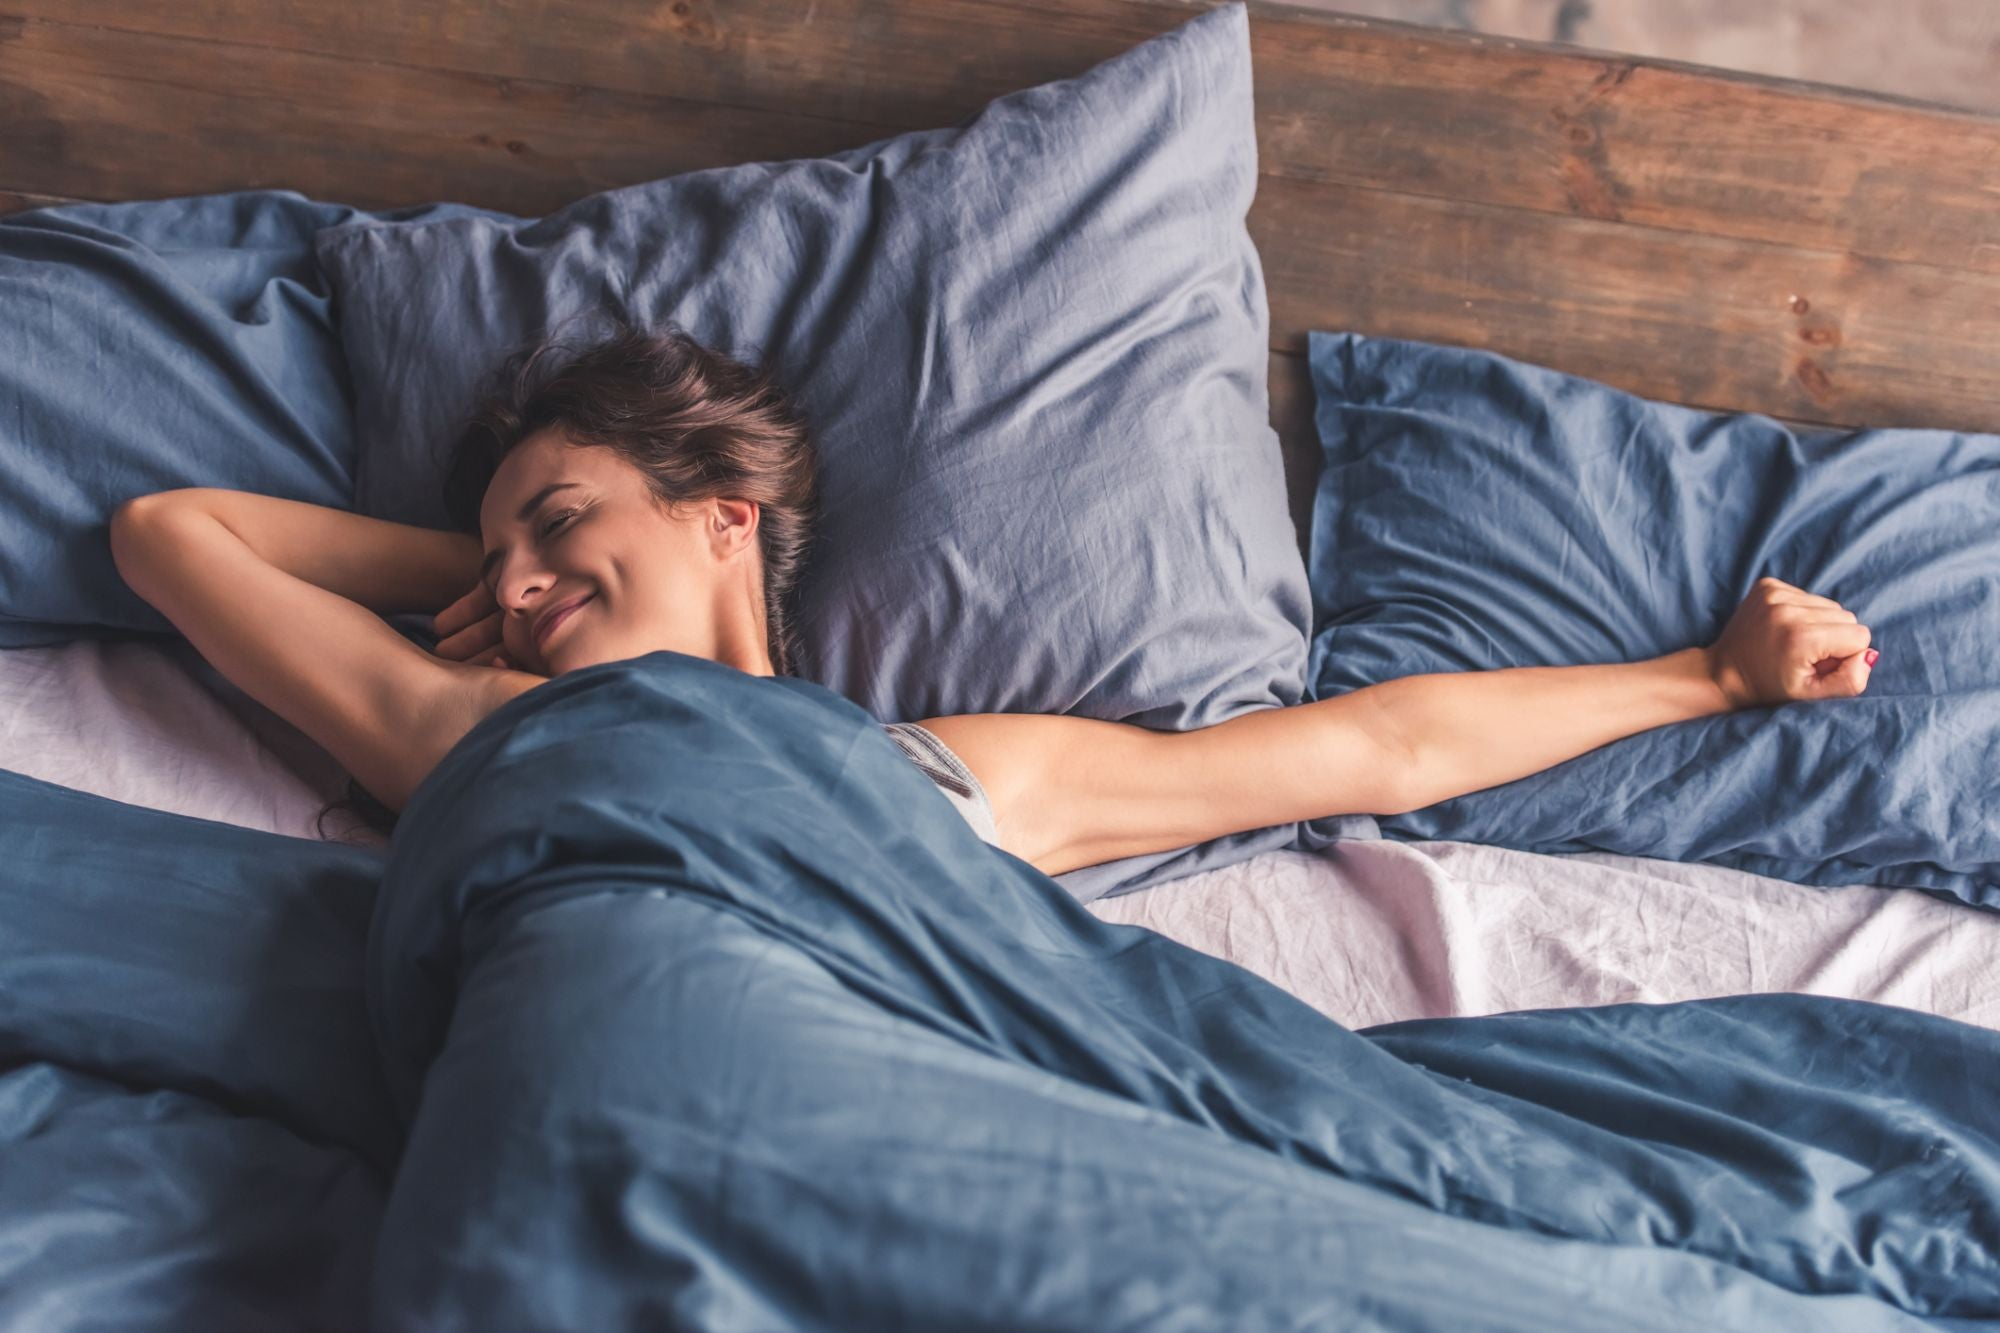 entrepreneur.com - Vernon Lindsay - To be an Overnight Success Tomorrow, Get a Good Night's Sleep Tonight